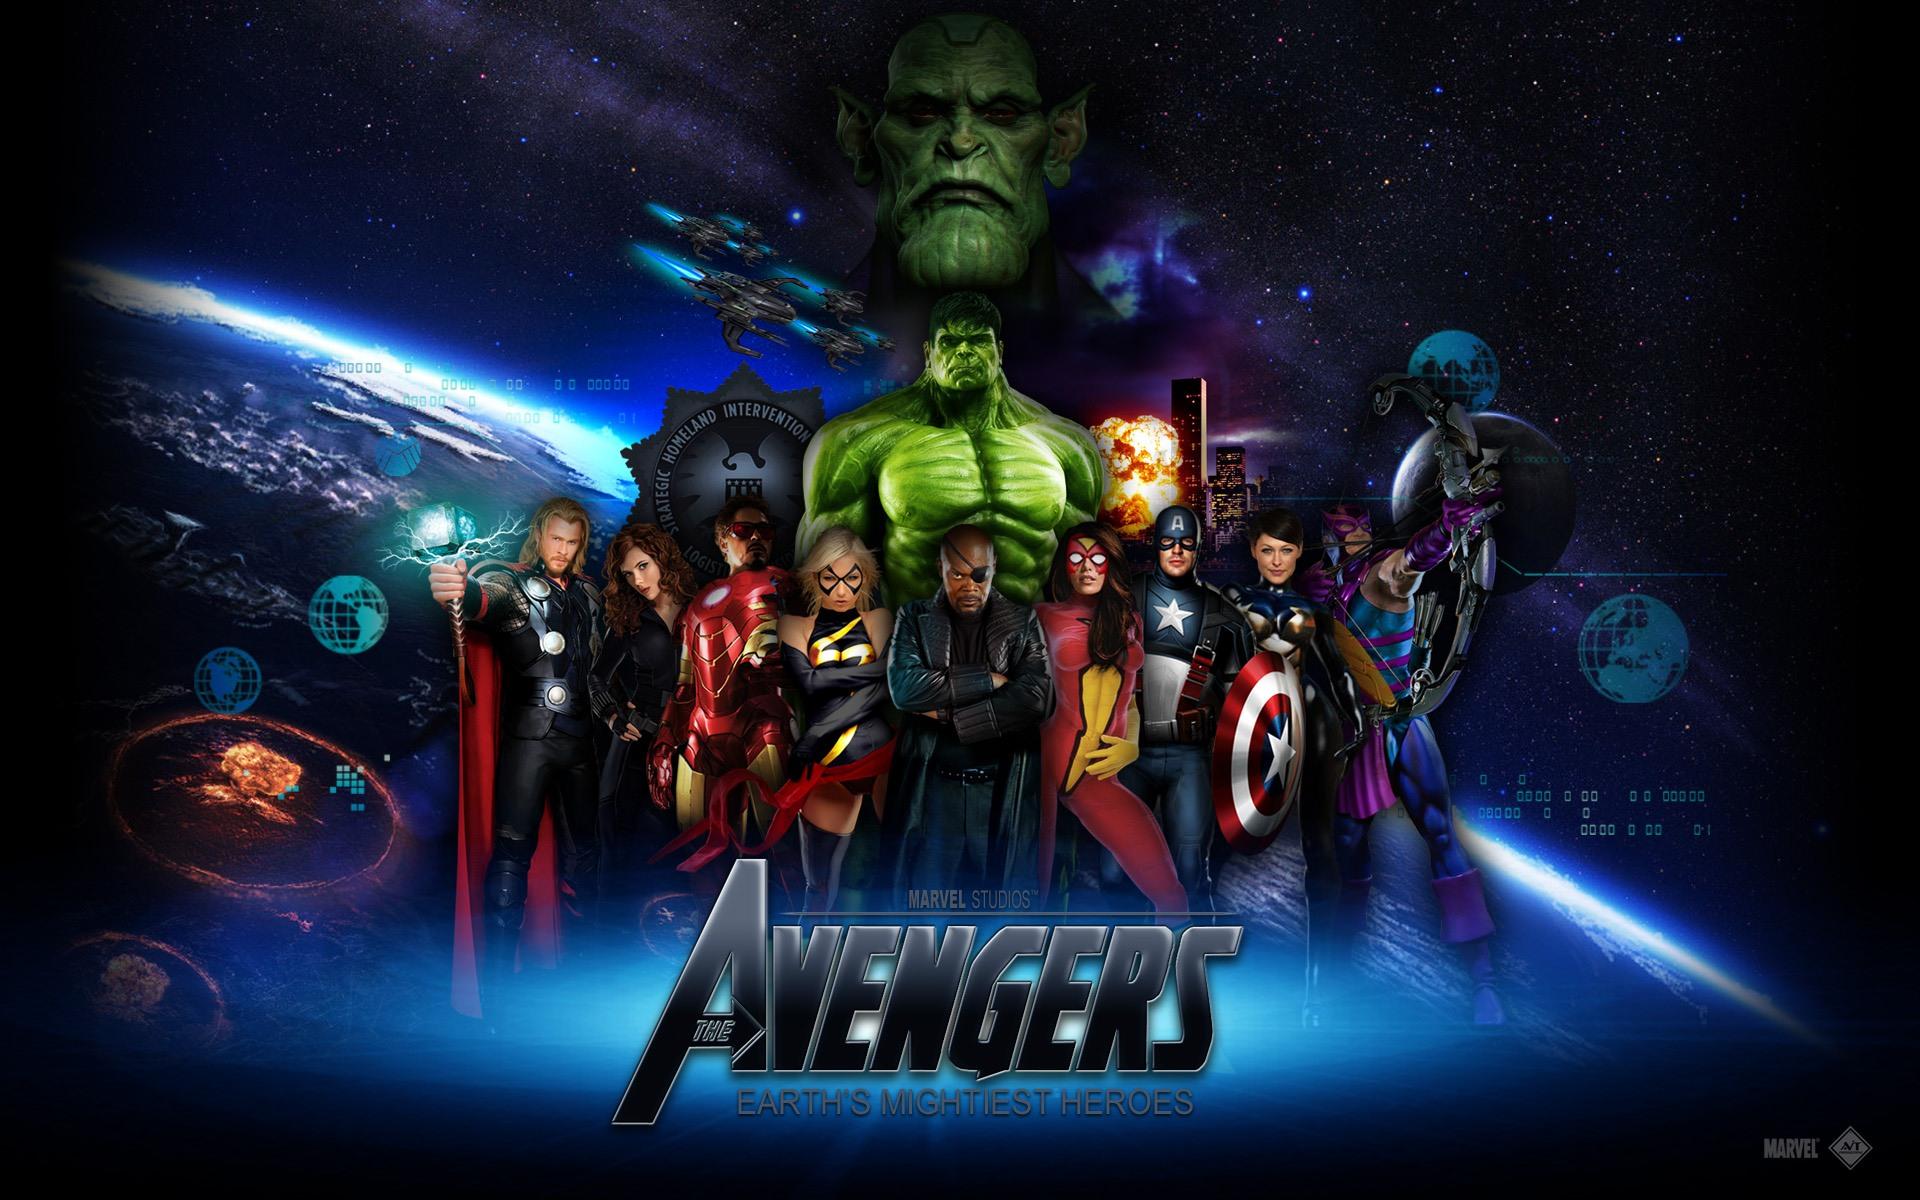 50 Avengers Movie Wallpaper On Wallpapersafari